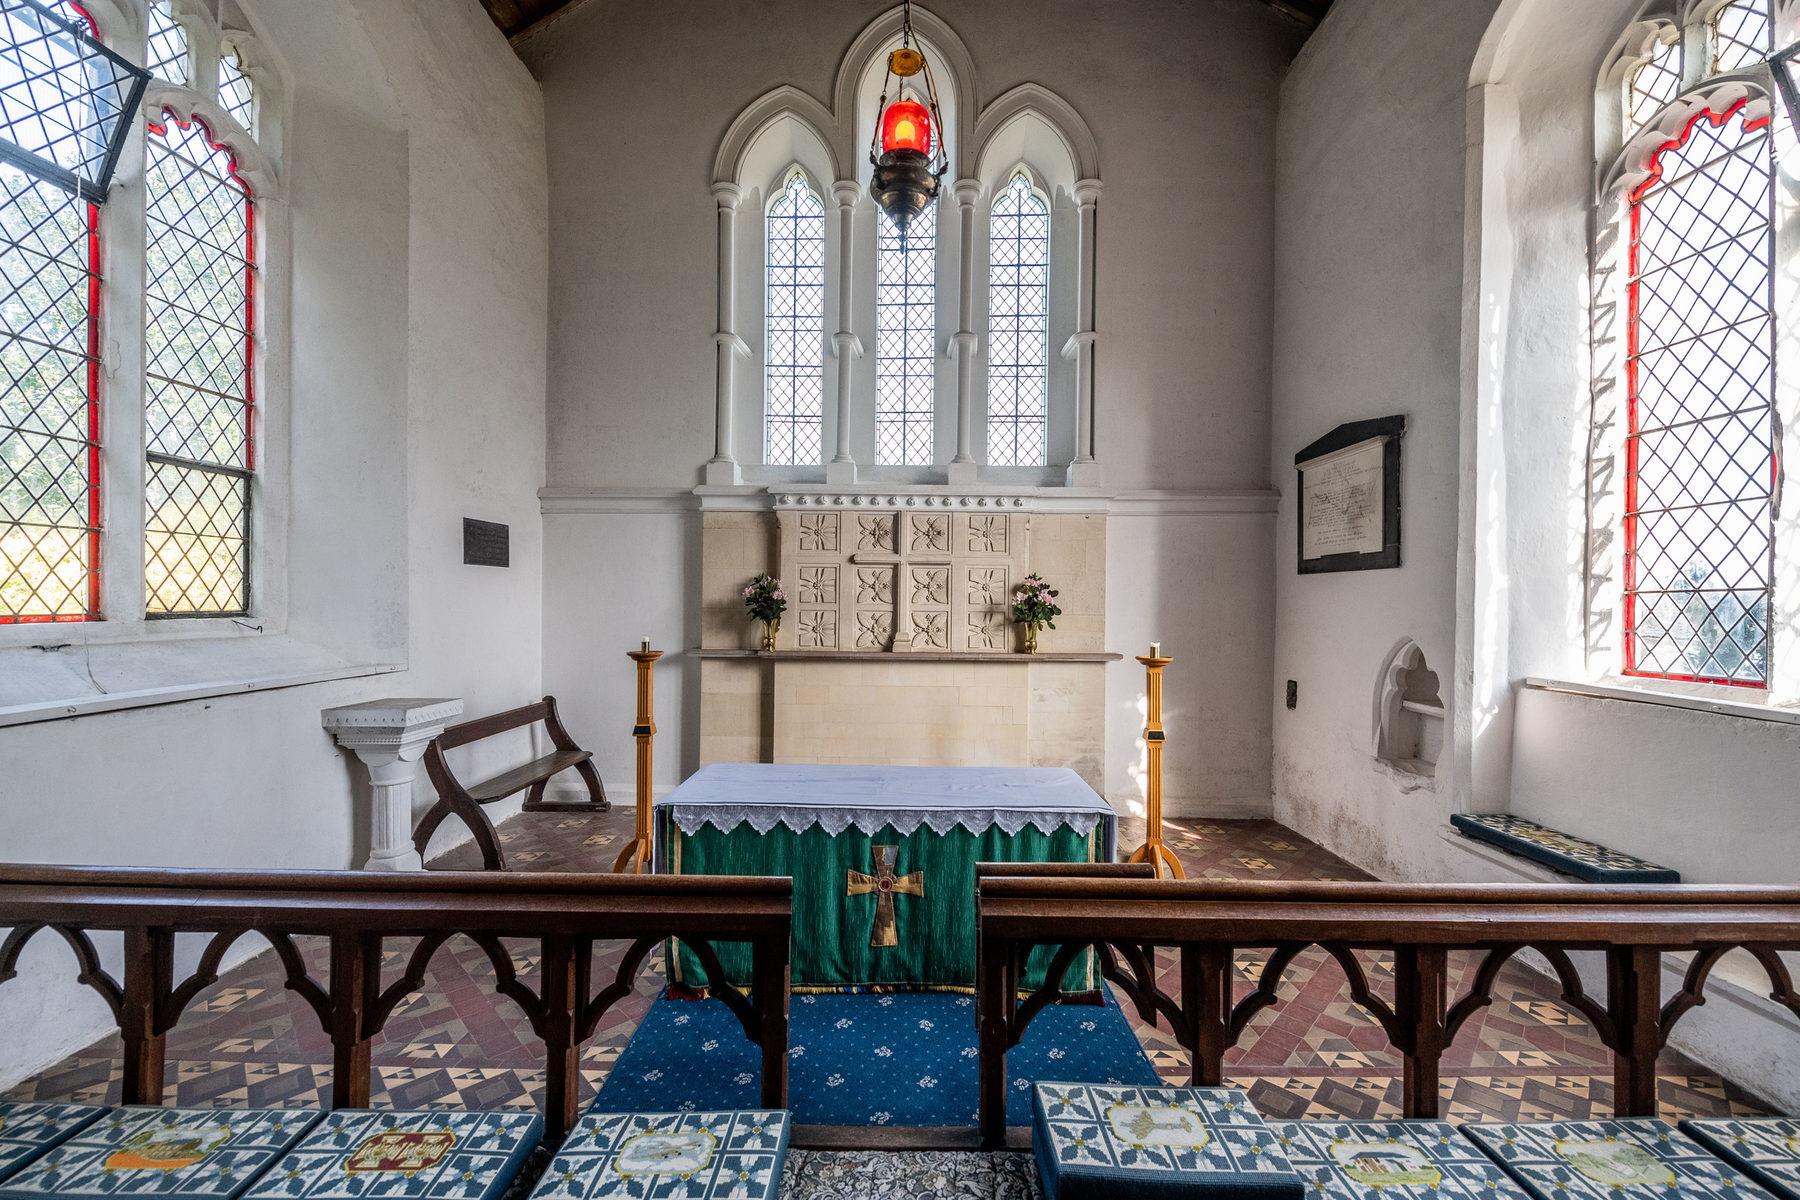 020 Bexwell Church 2018